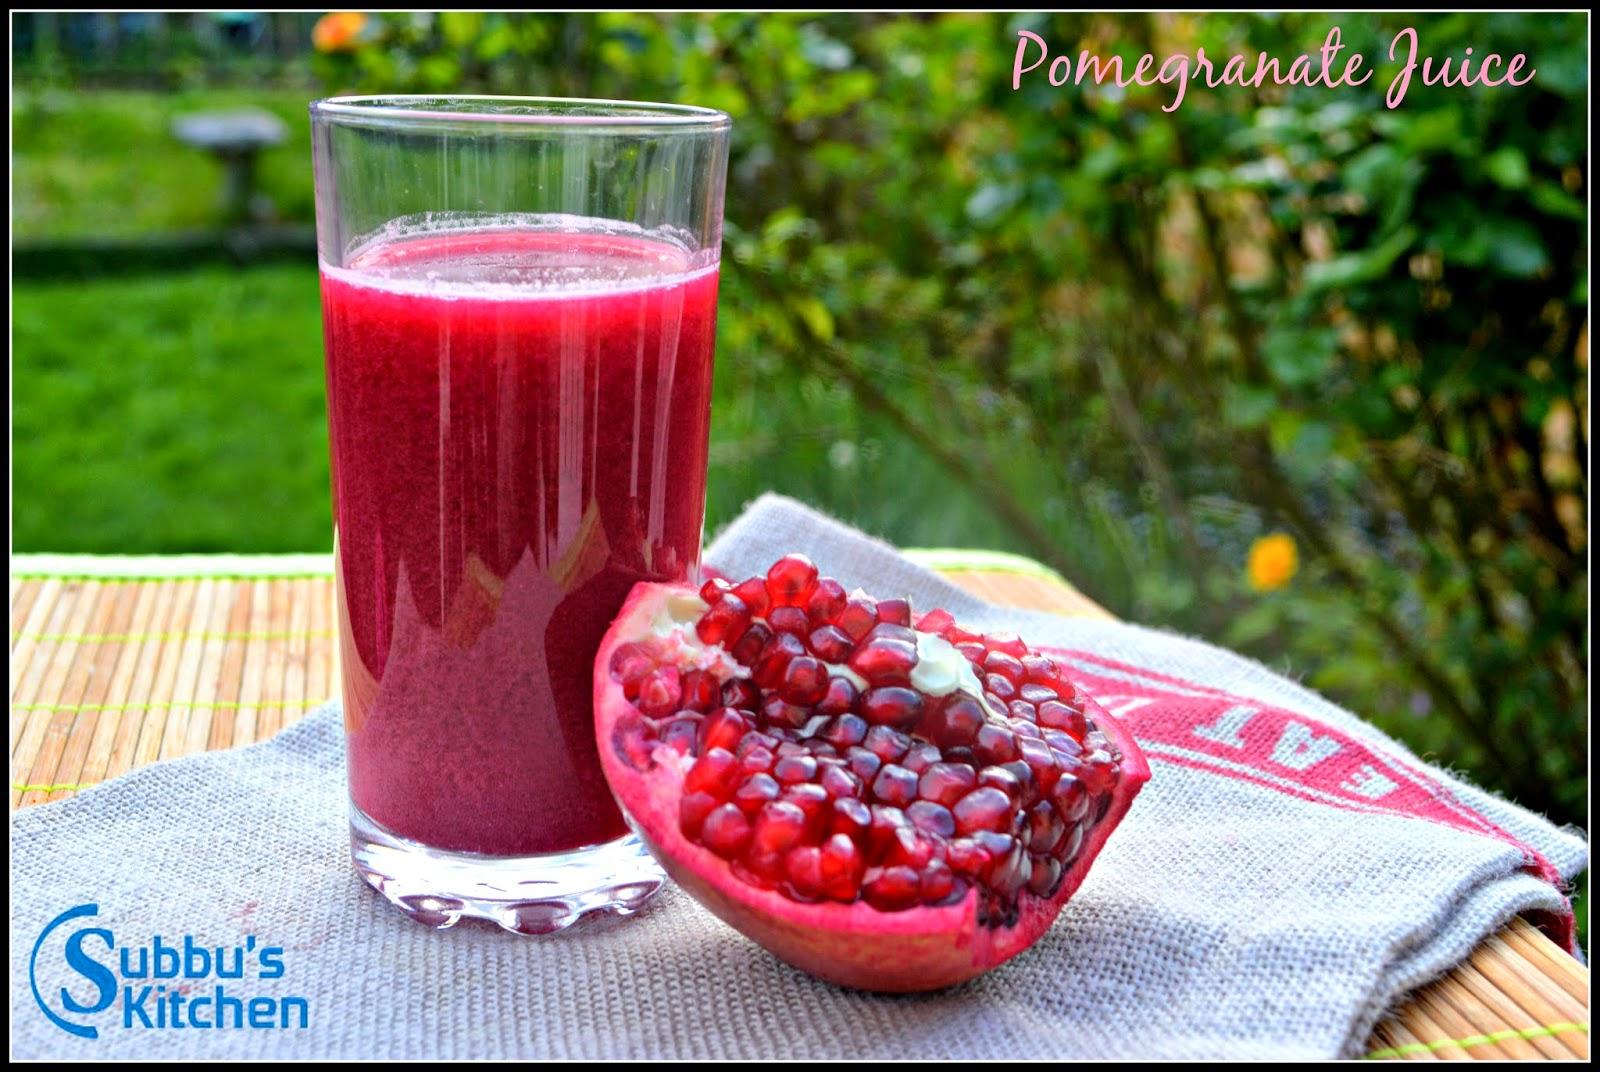 How to Prepare Pomegranate Juice, Seeding Pomegranate, Pomegranate Juice